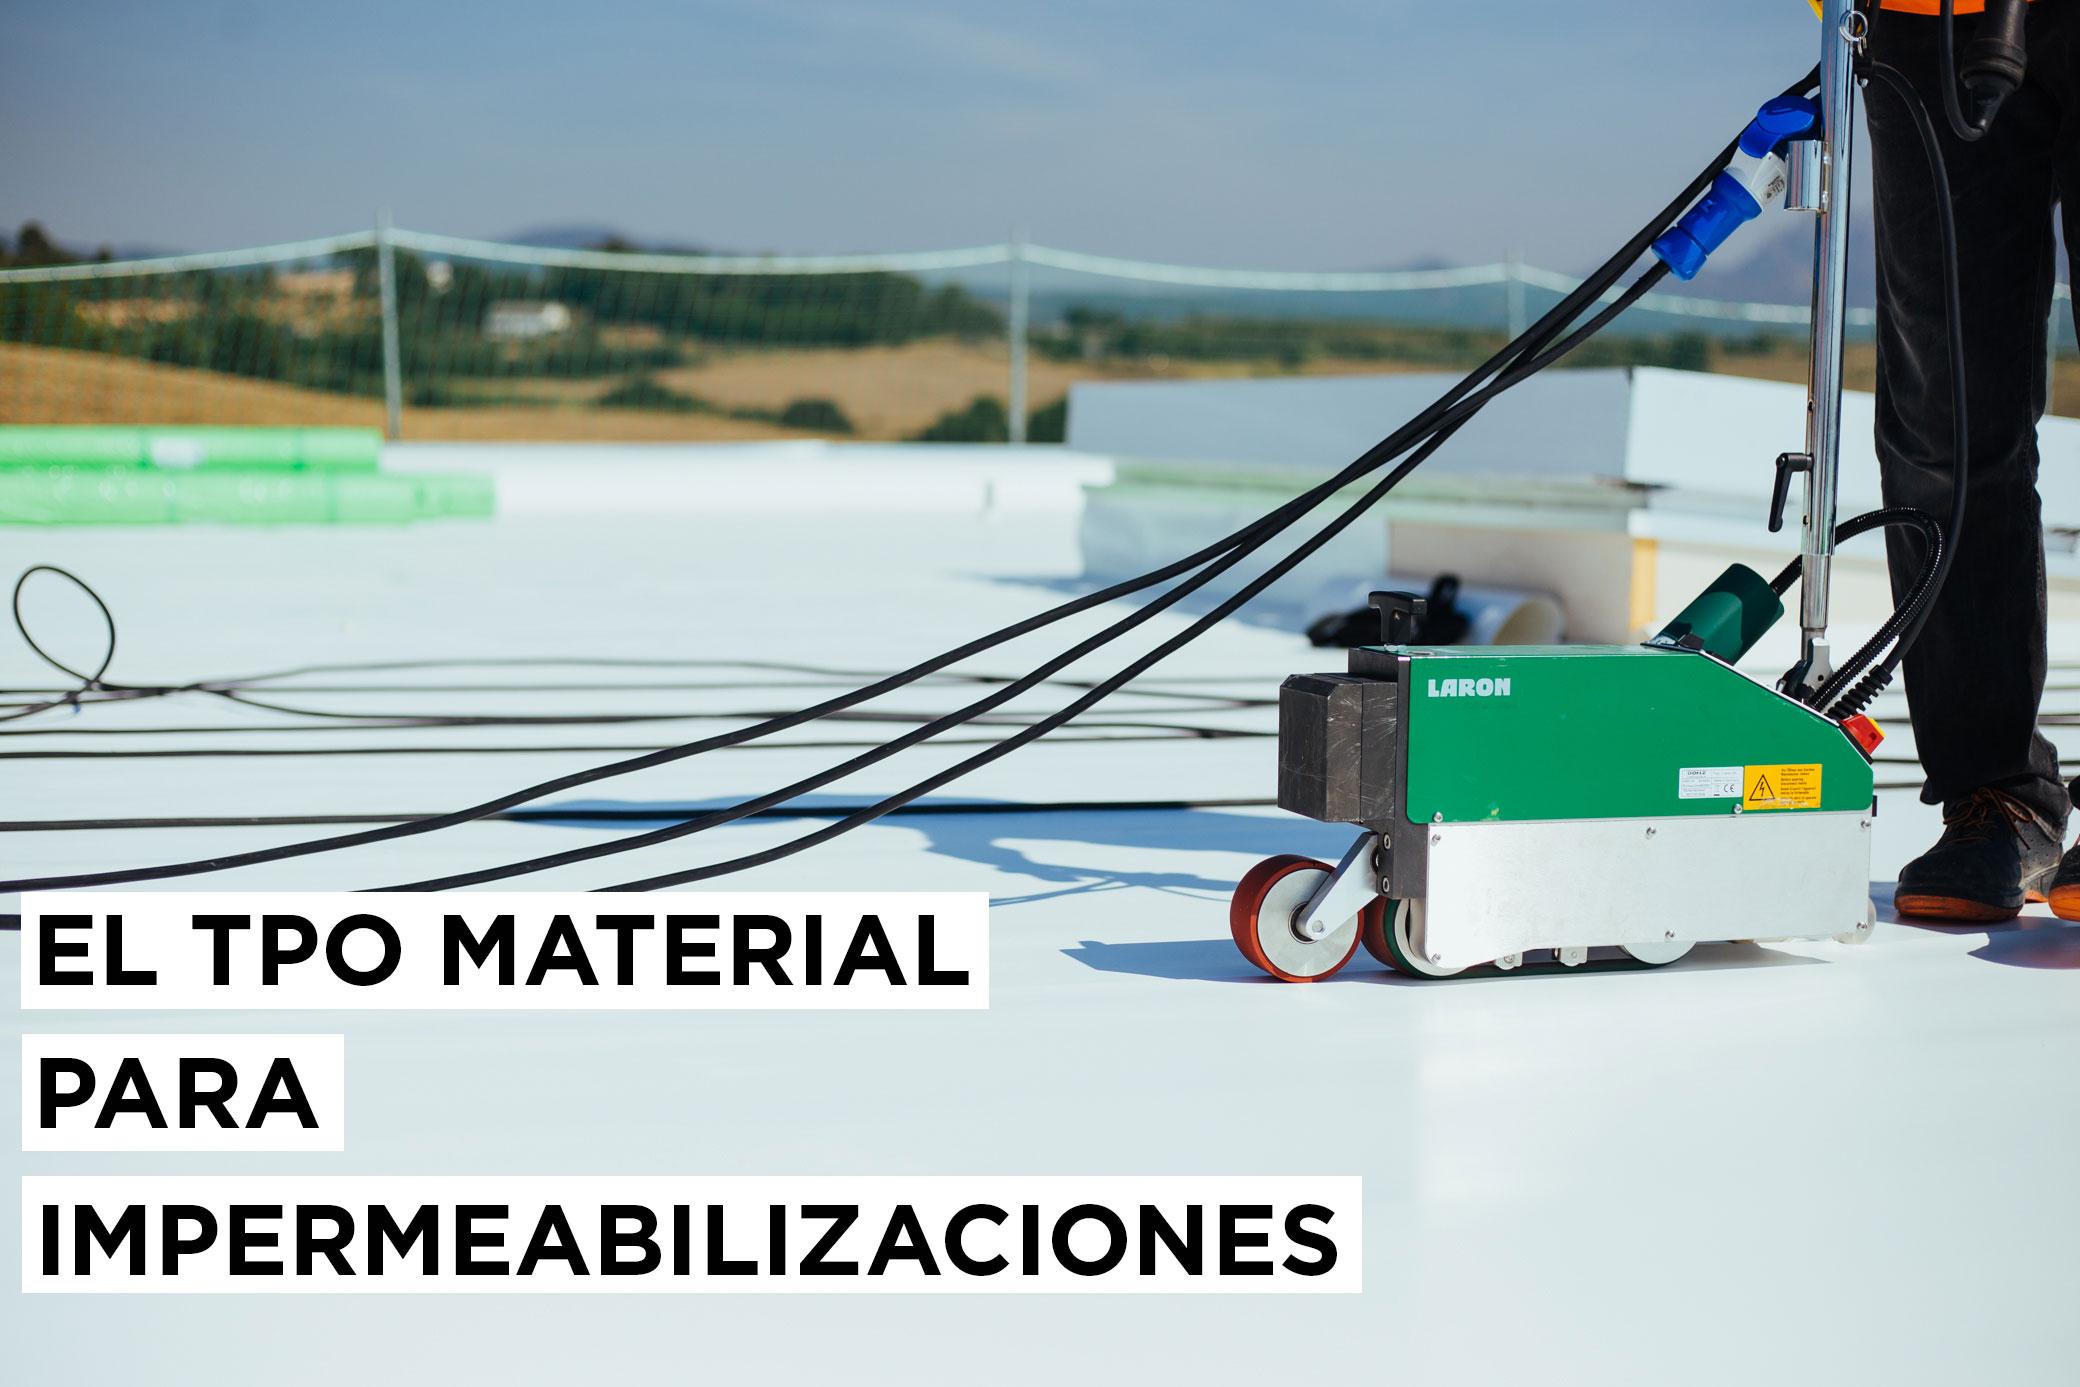 El TPO material para impermeabilizaciones 16